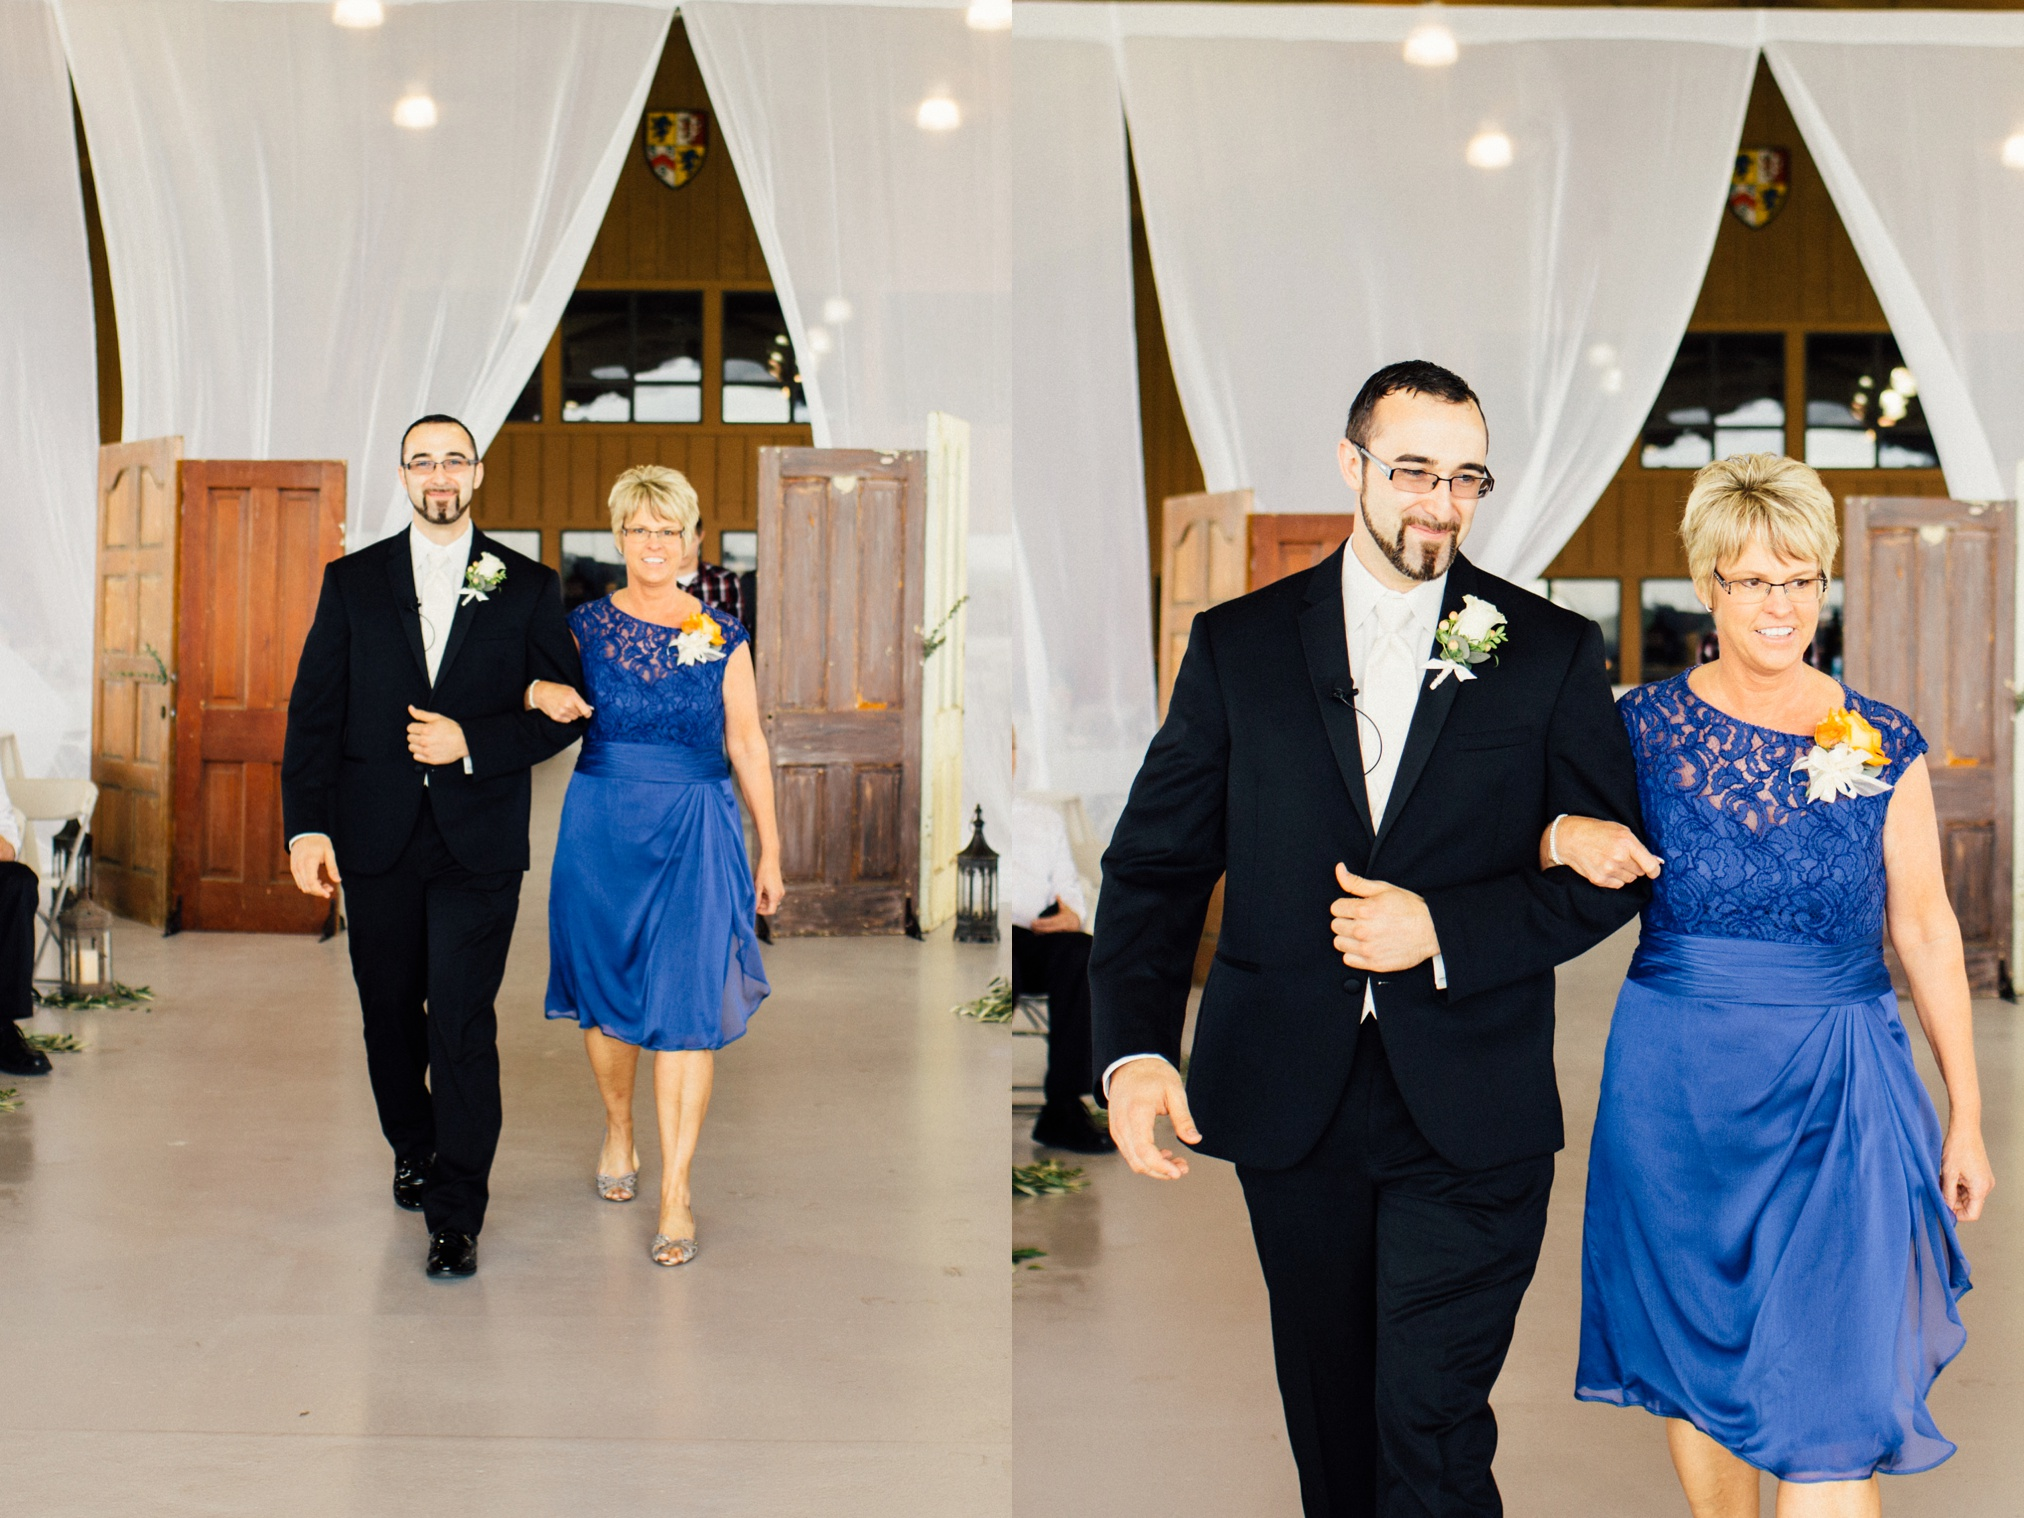 schmid_wedding-312.jpg